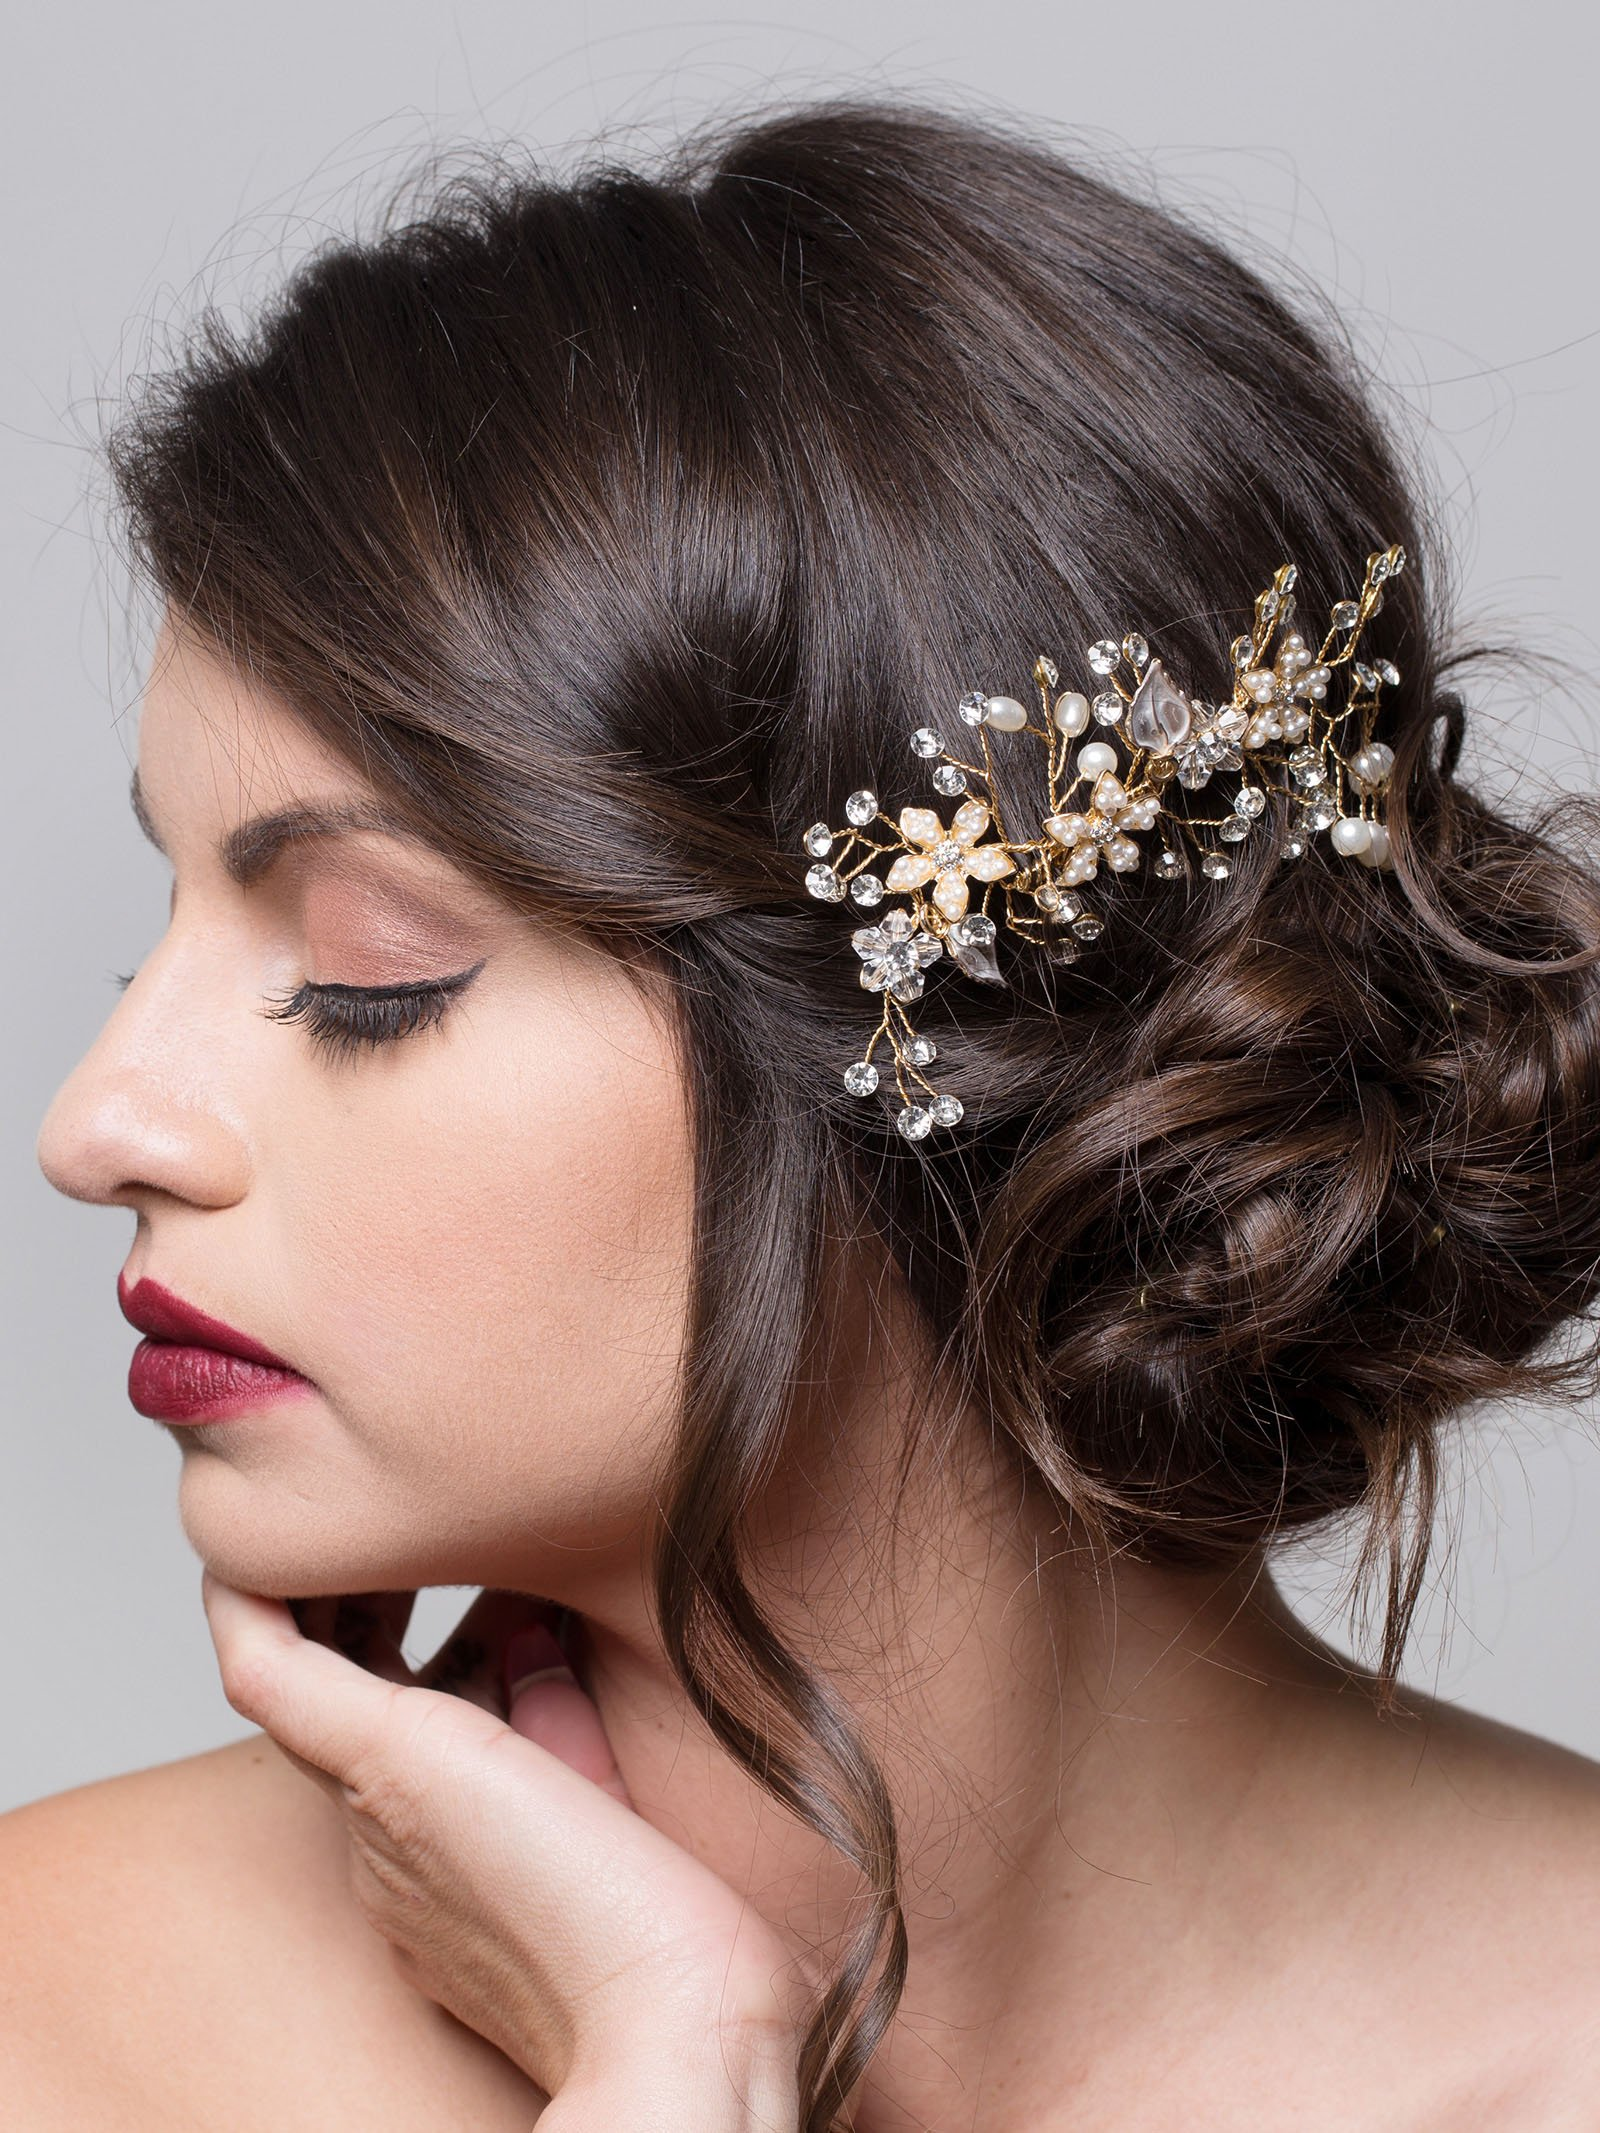 AW BRIDAL Crystal Hair Side Combs Pearl Hair Clip Wedding Headpiece Women Hair Accessory